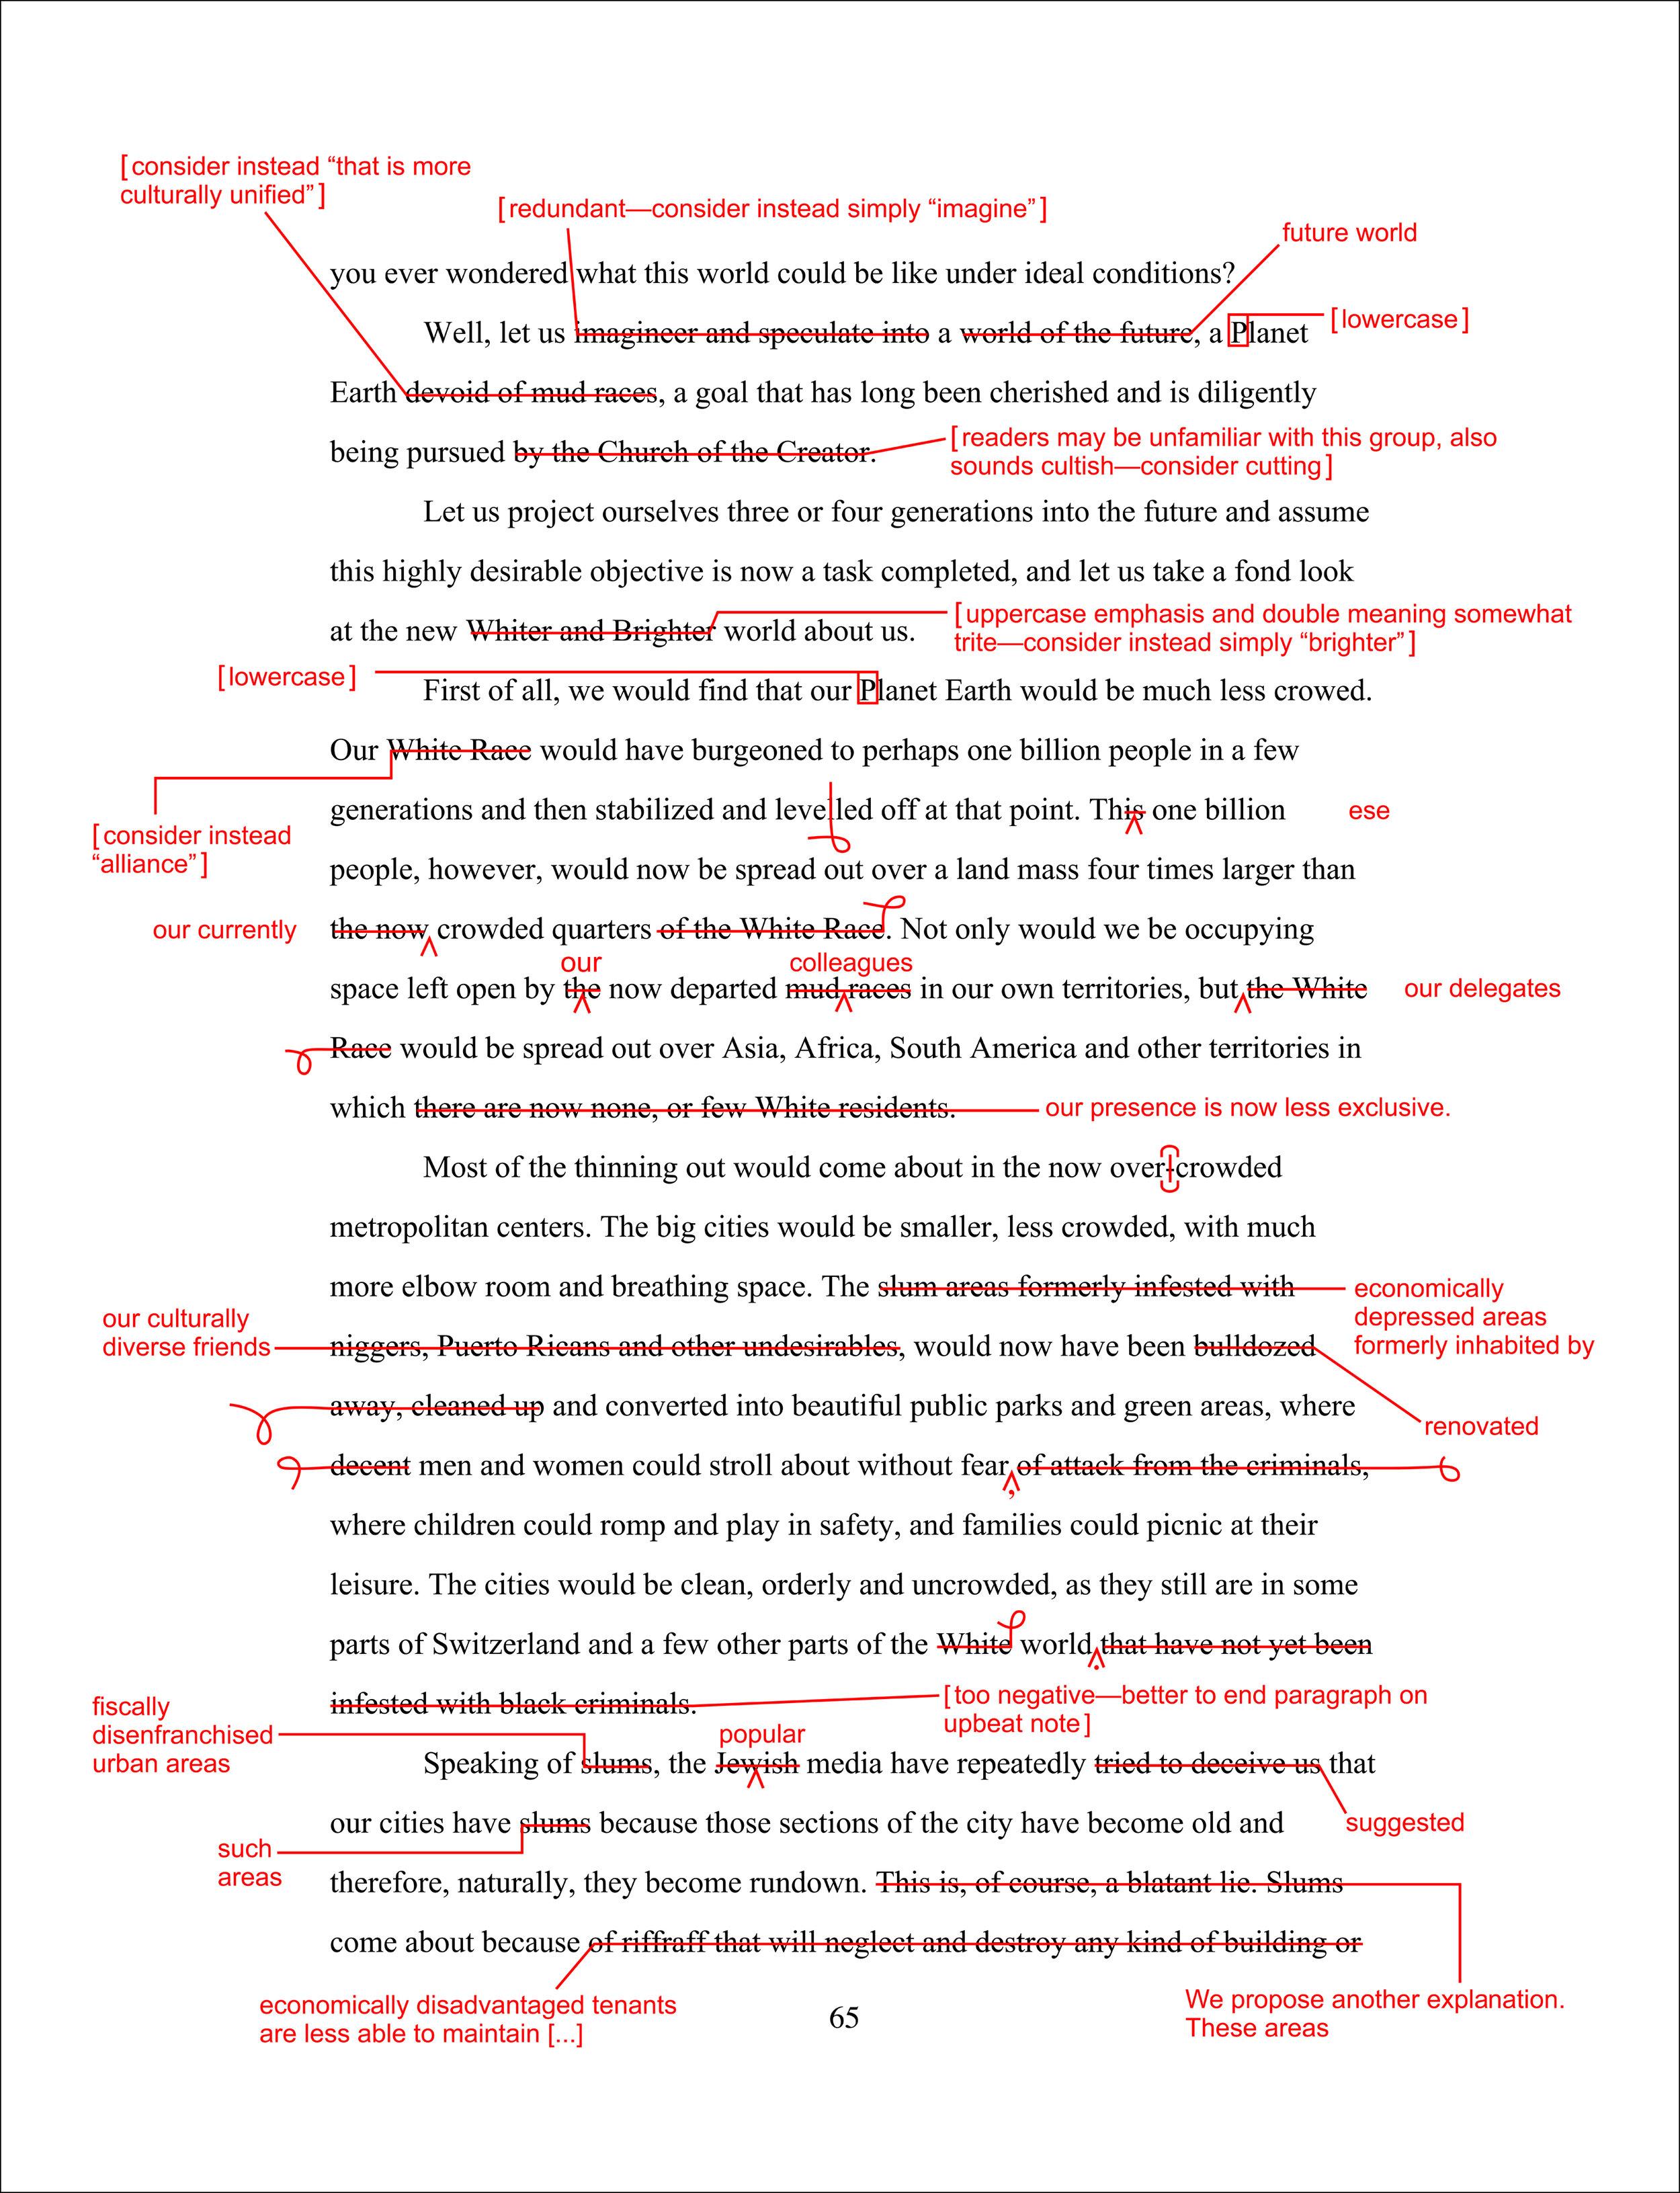 Charles Gute. Whitewash Wordswap (An Excerpt), 2007